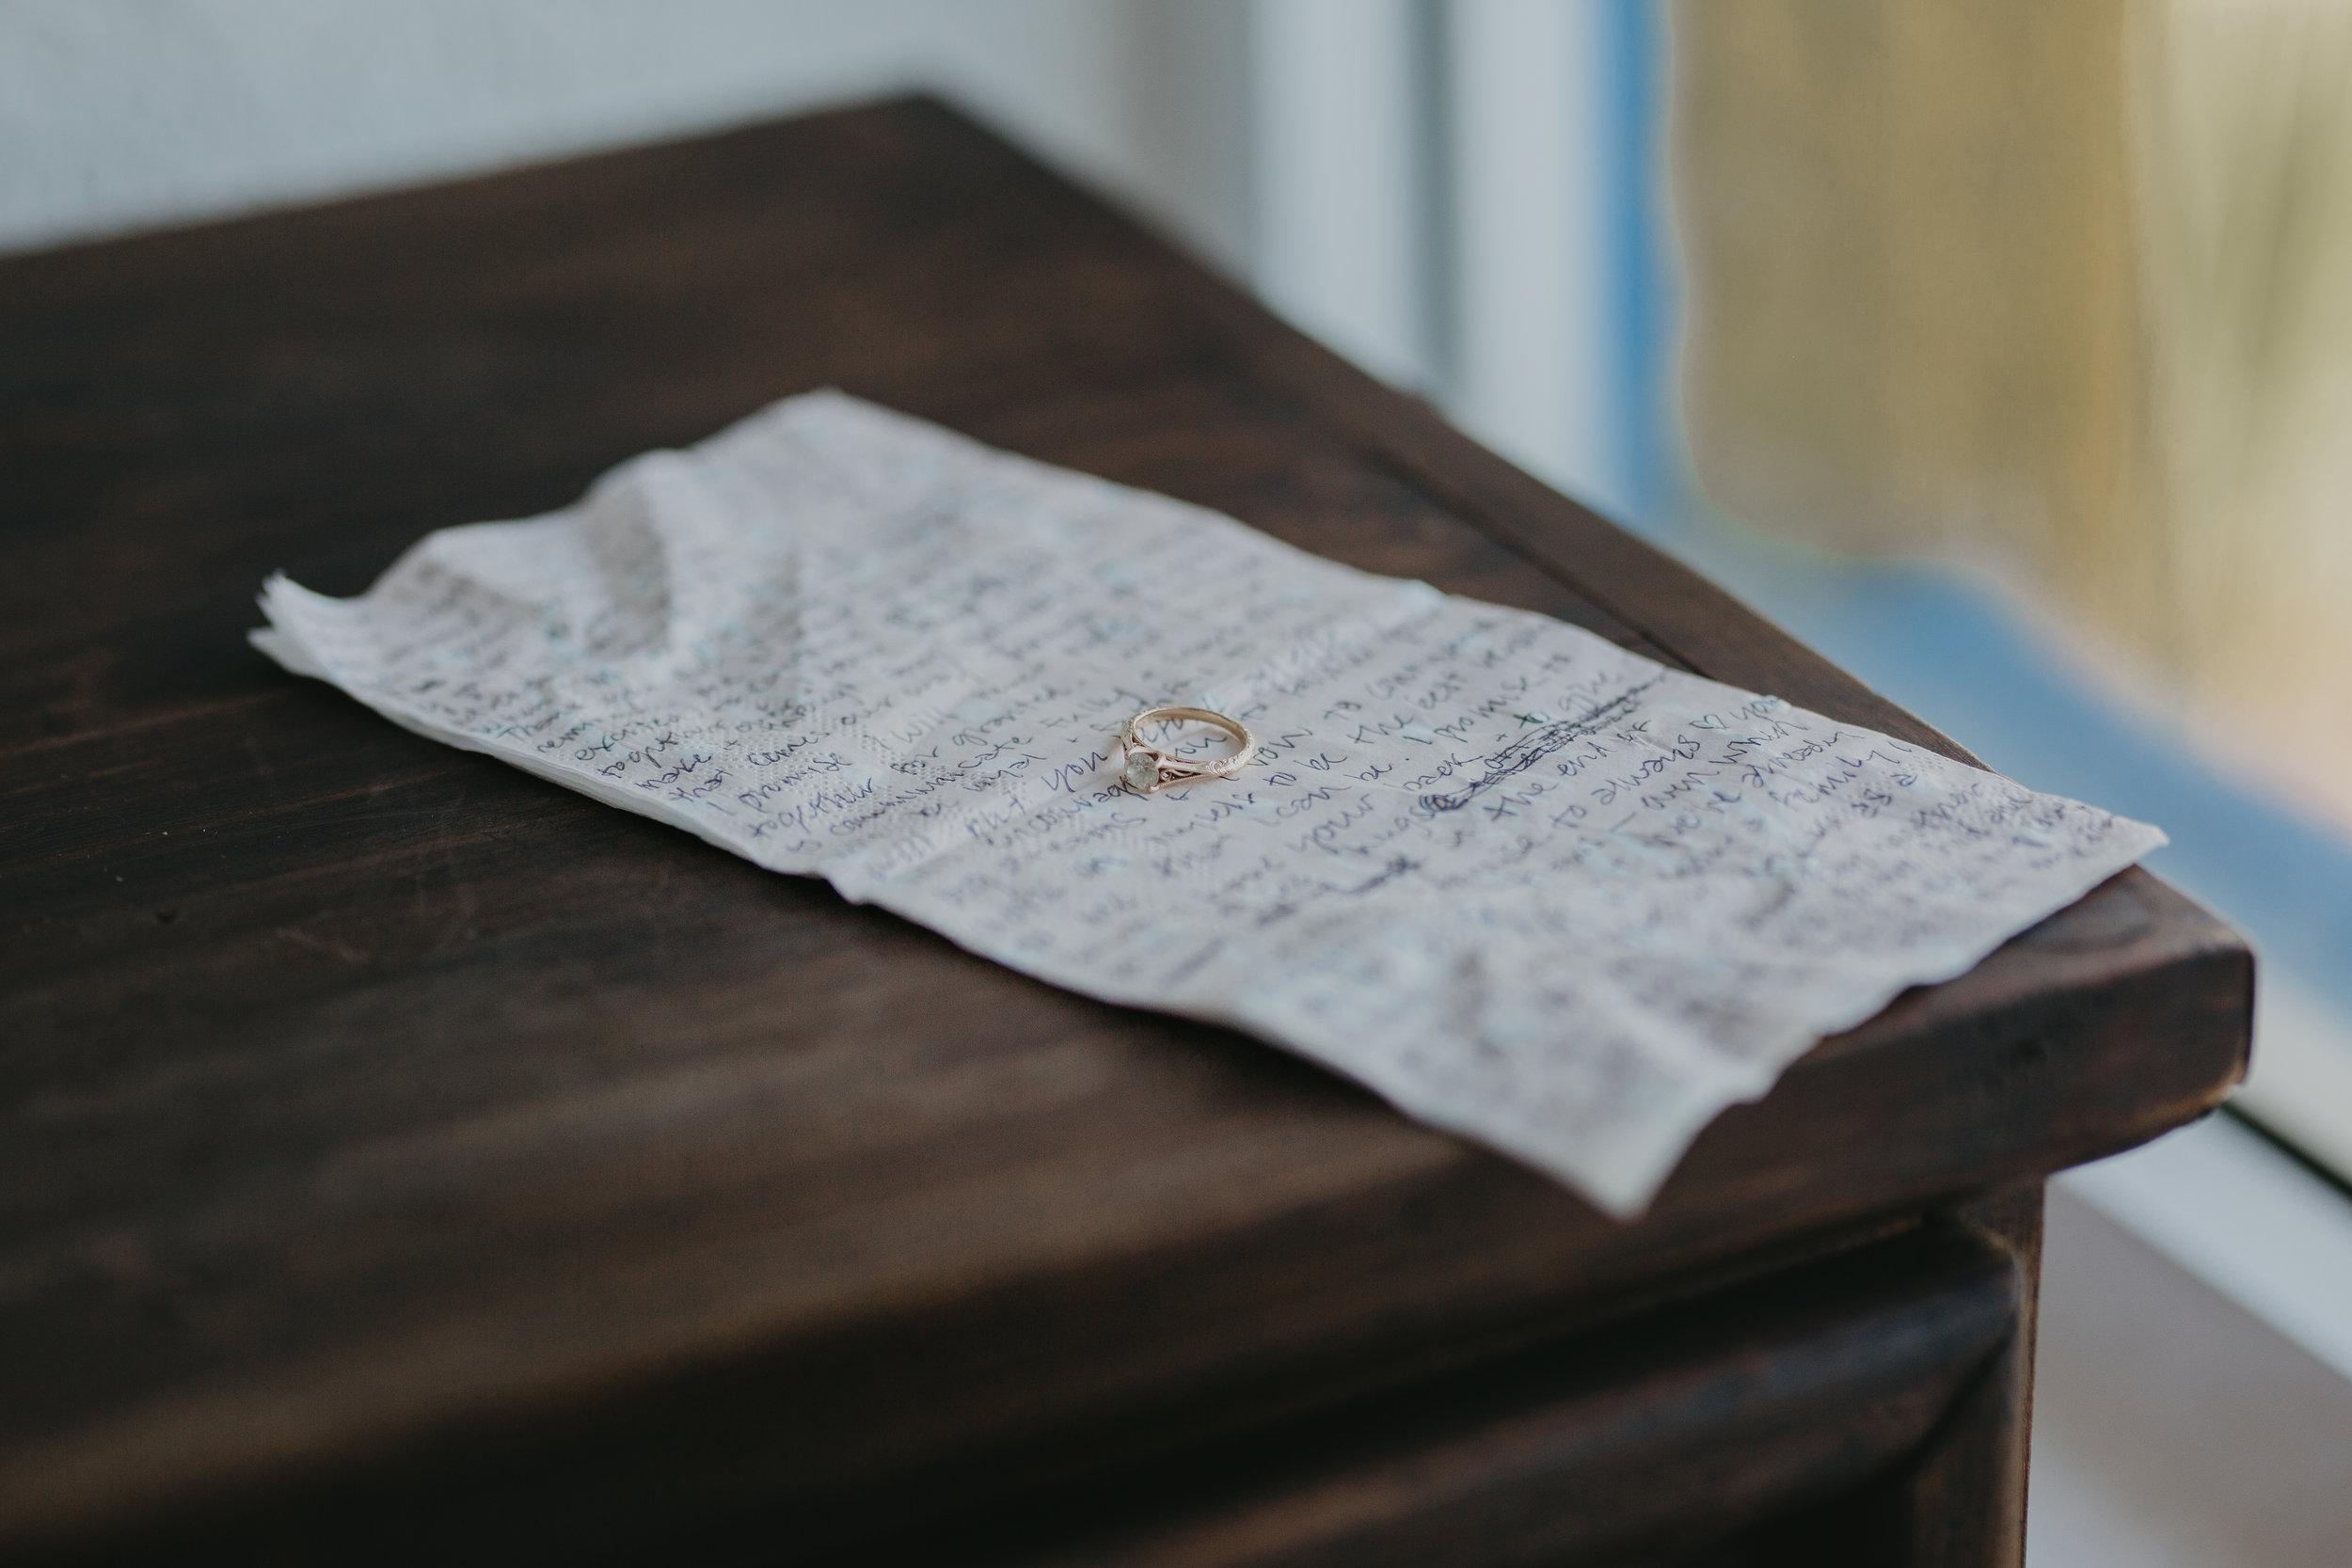 Nicole-Daacke-Photography-beachfront-akumal-destionation-wedding-tulum-mexico-elopement-photographer-destination-wedding-inspiration-sunset-champagne-pop-boho-bride-ocean-tropical-bohemian-tulum-wedding-photos-142.jpg